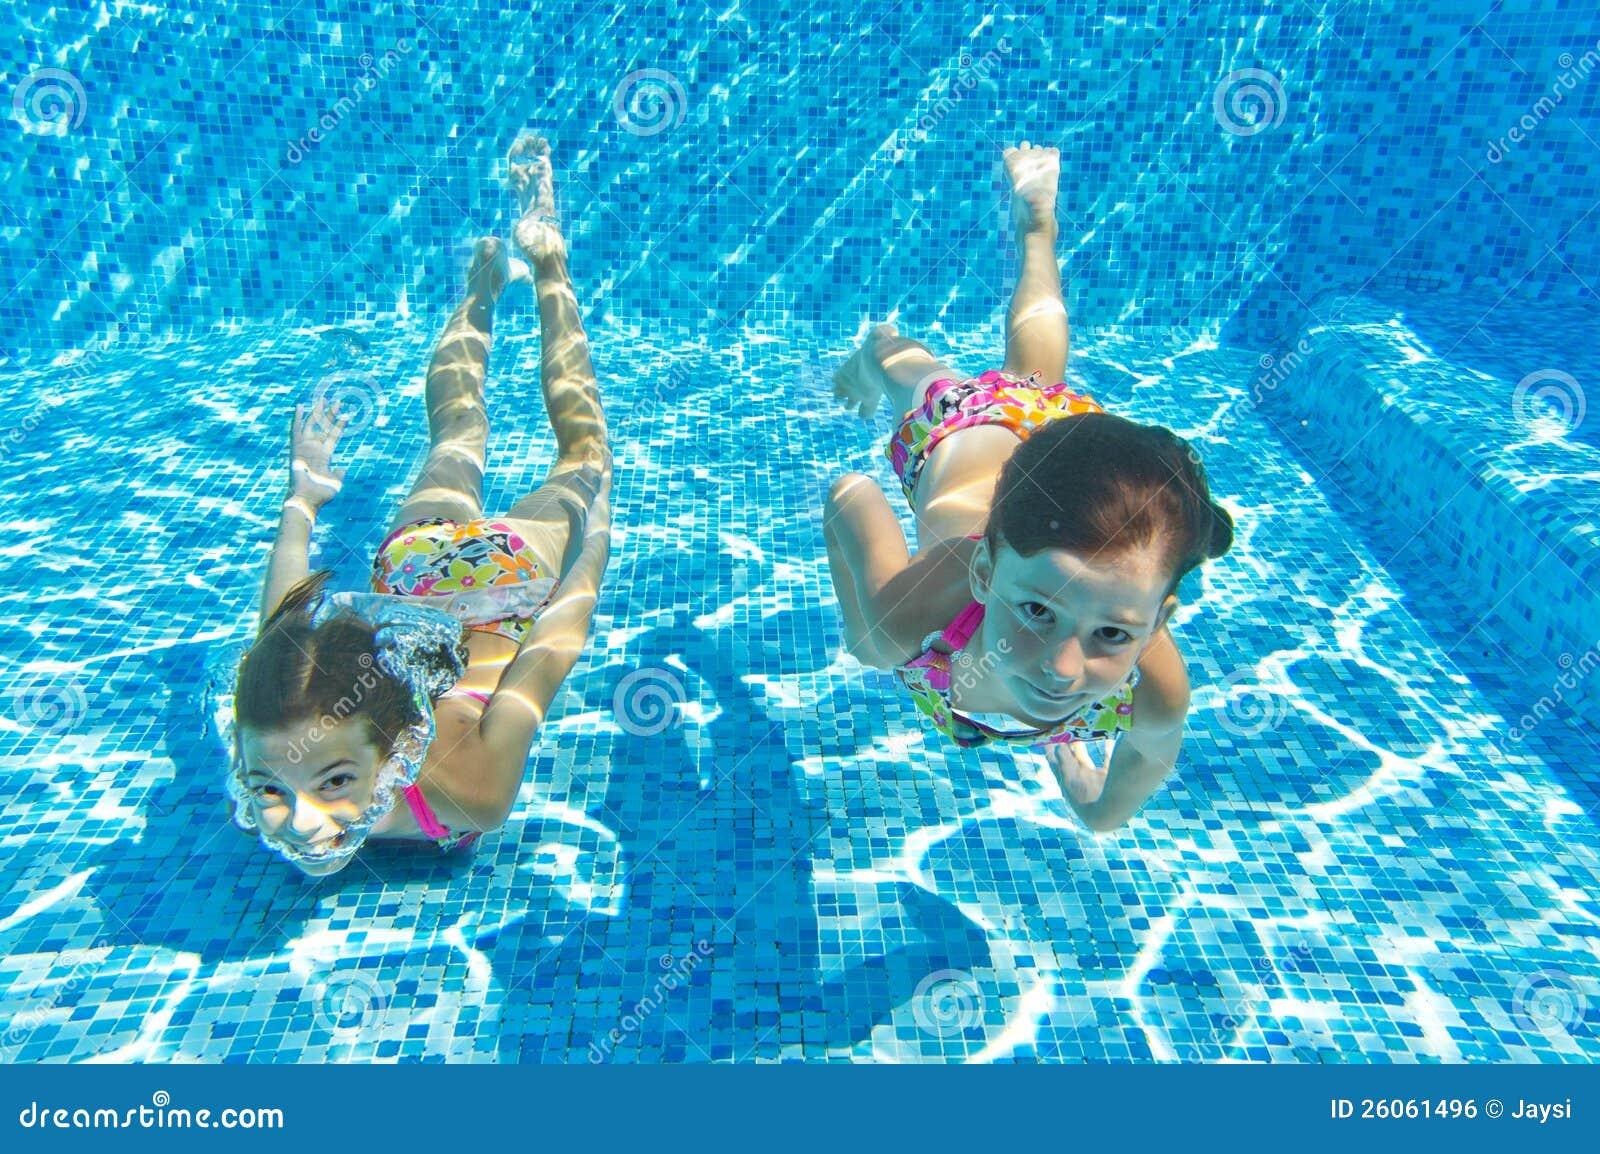 Kids swimming underwater pool children in swimming pool